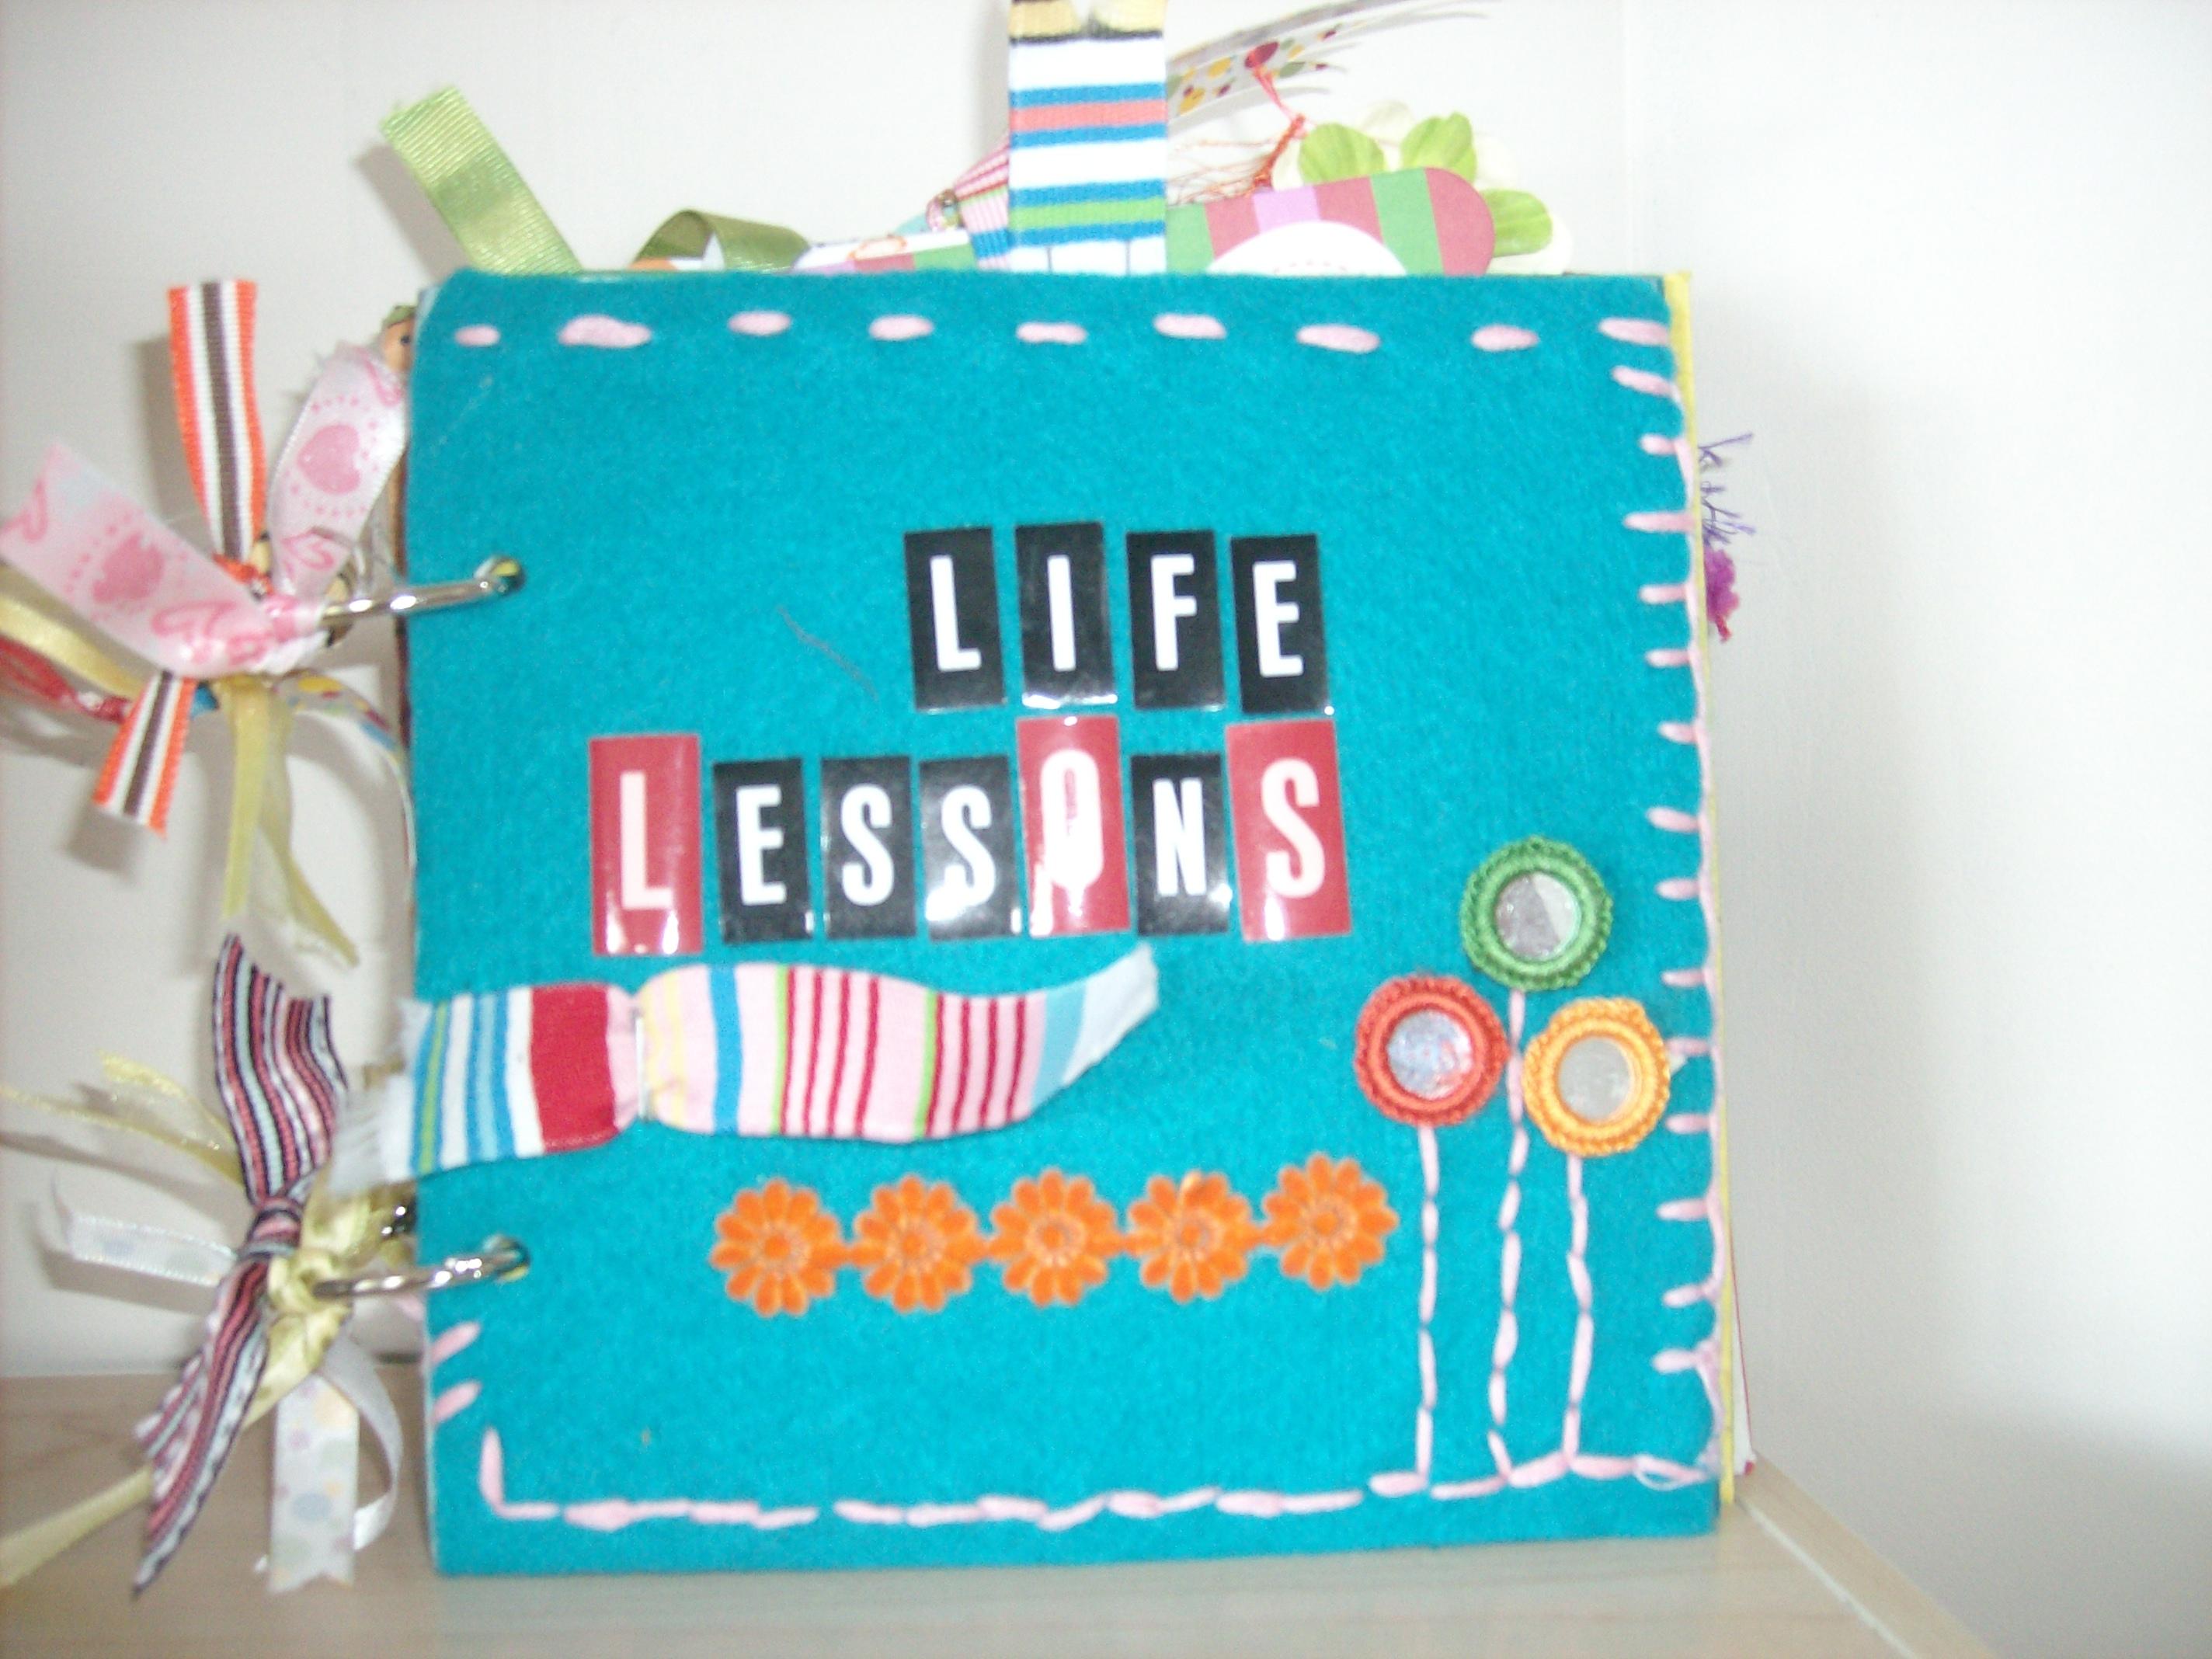 January scrapbook ideas - Scrapbook Layouts 021